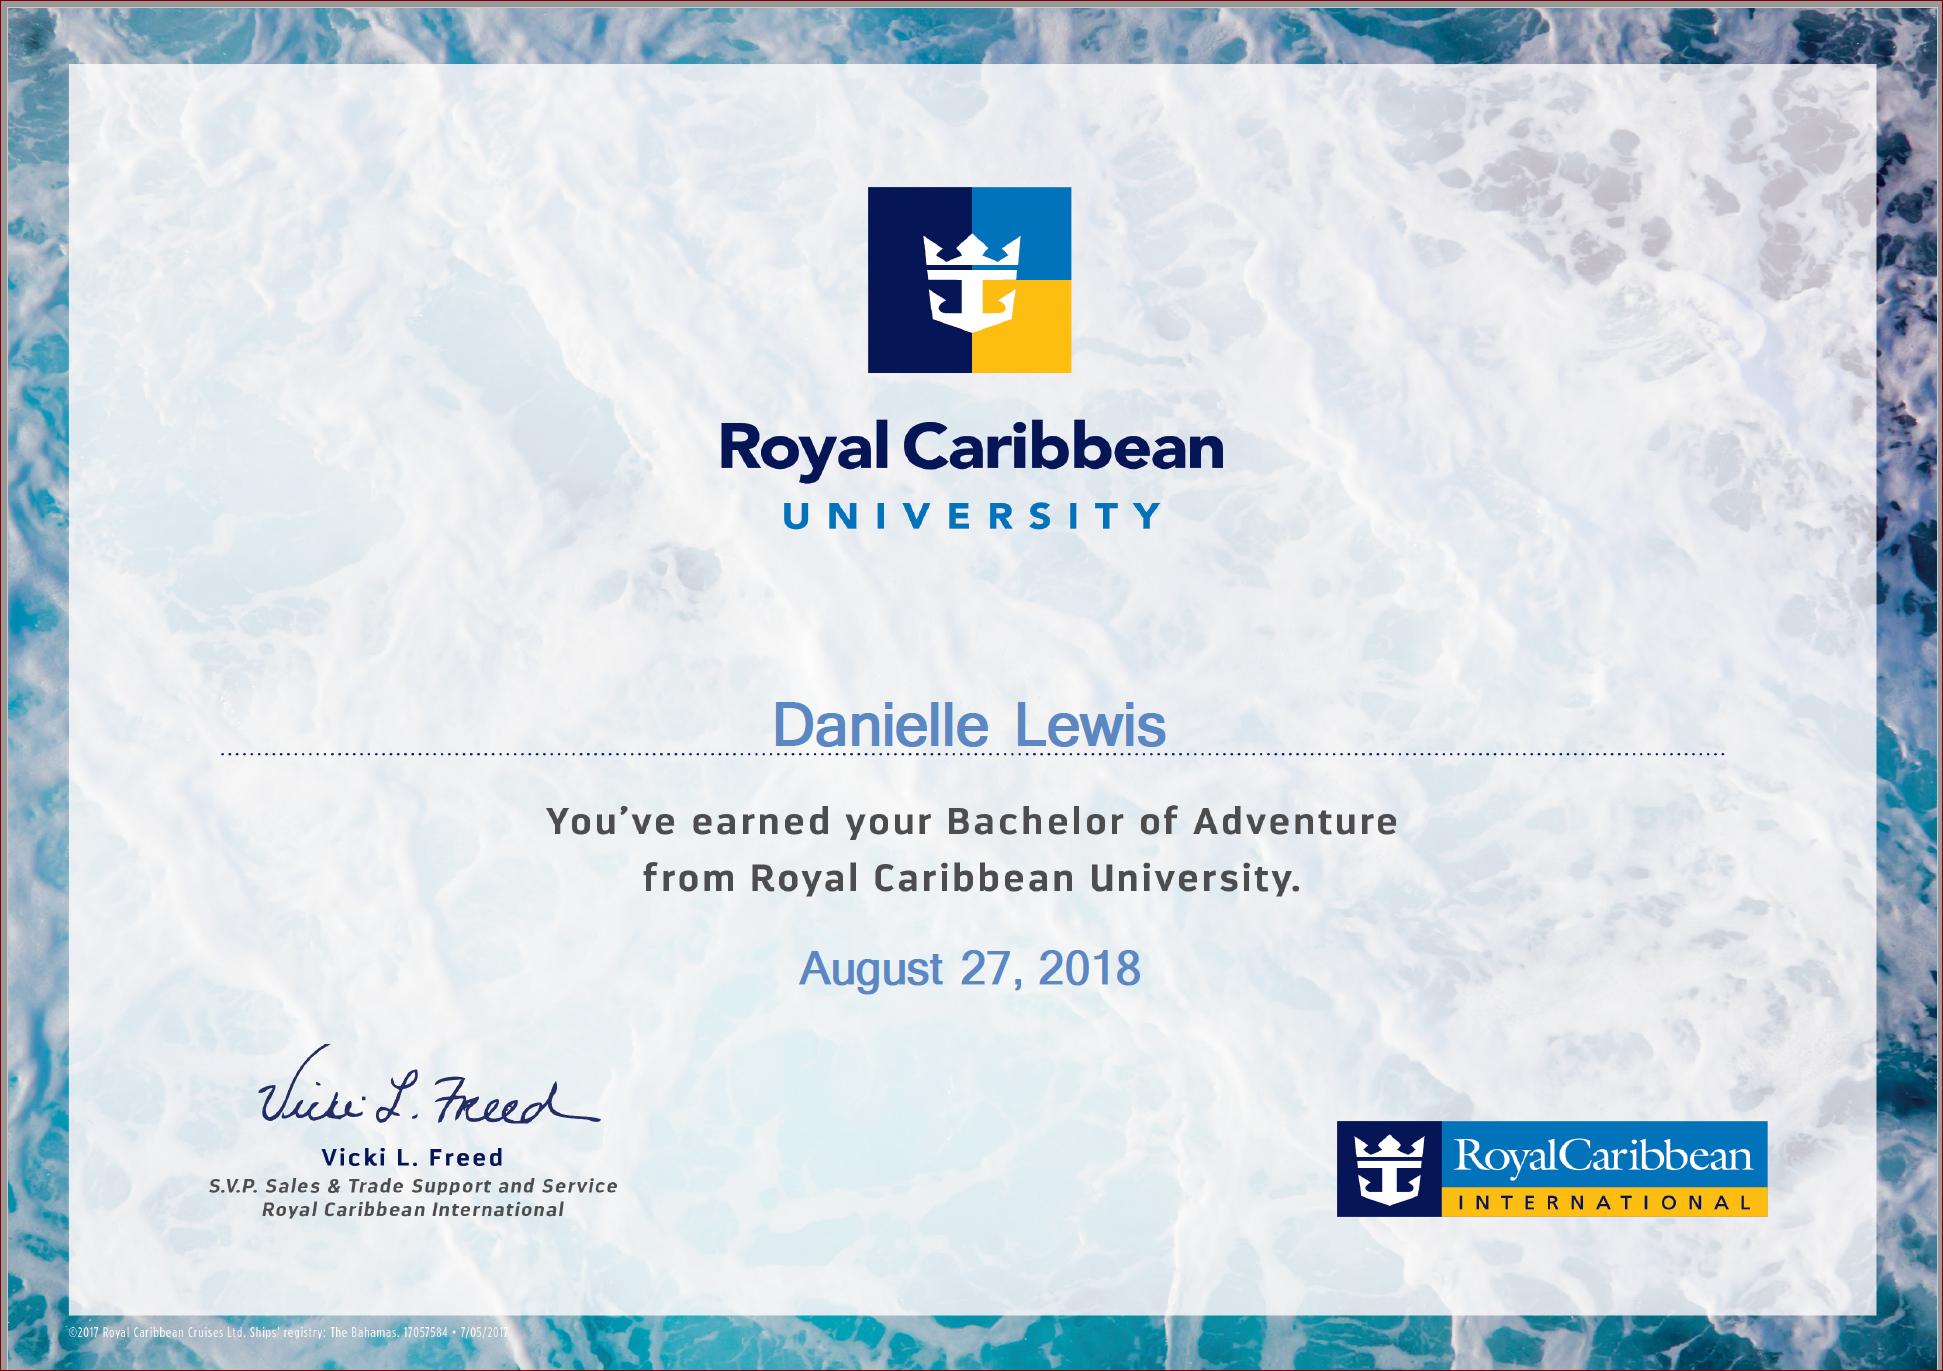 SelfishMe Travel - Royal Caribbean Cruise Line University Bachelor of Adventure